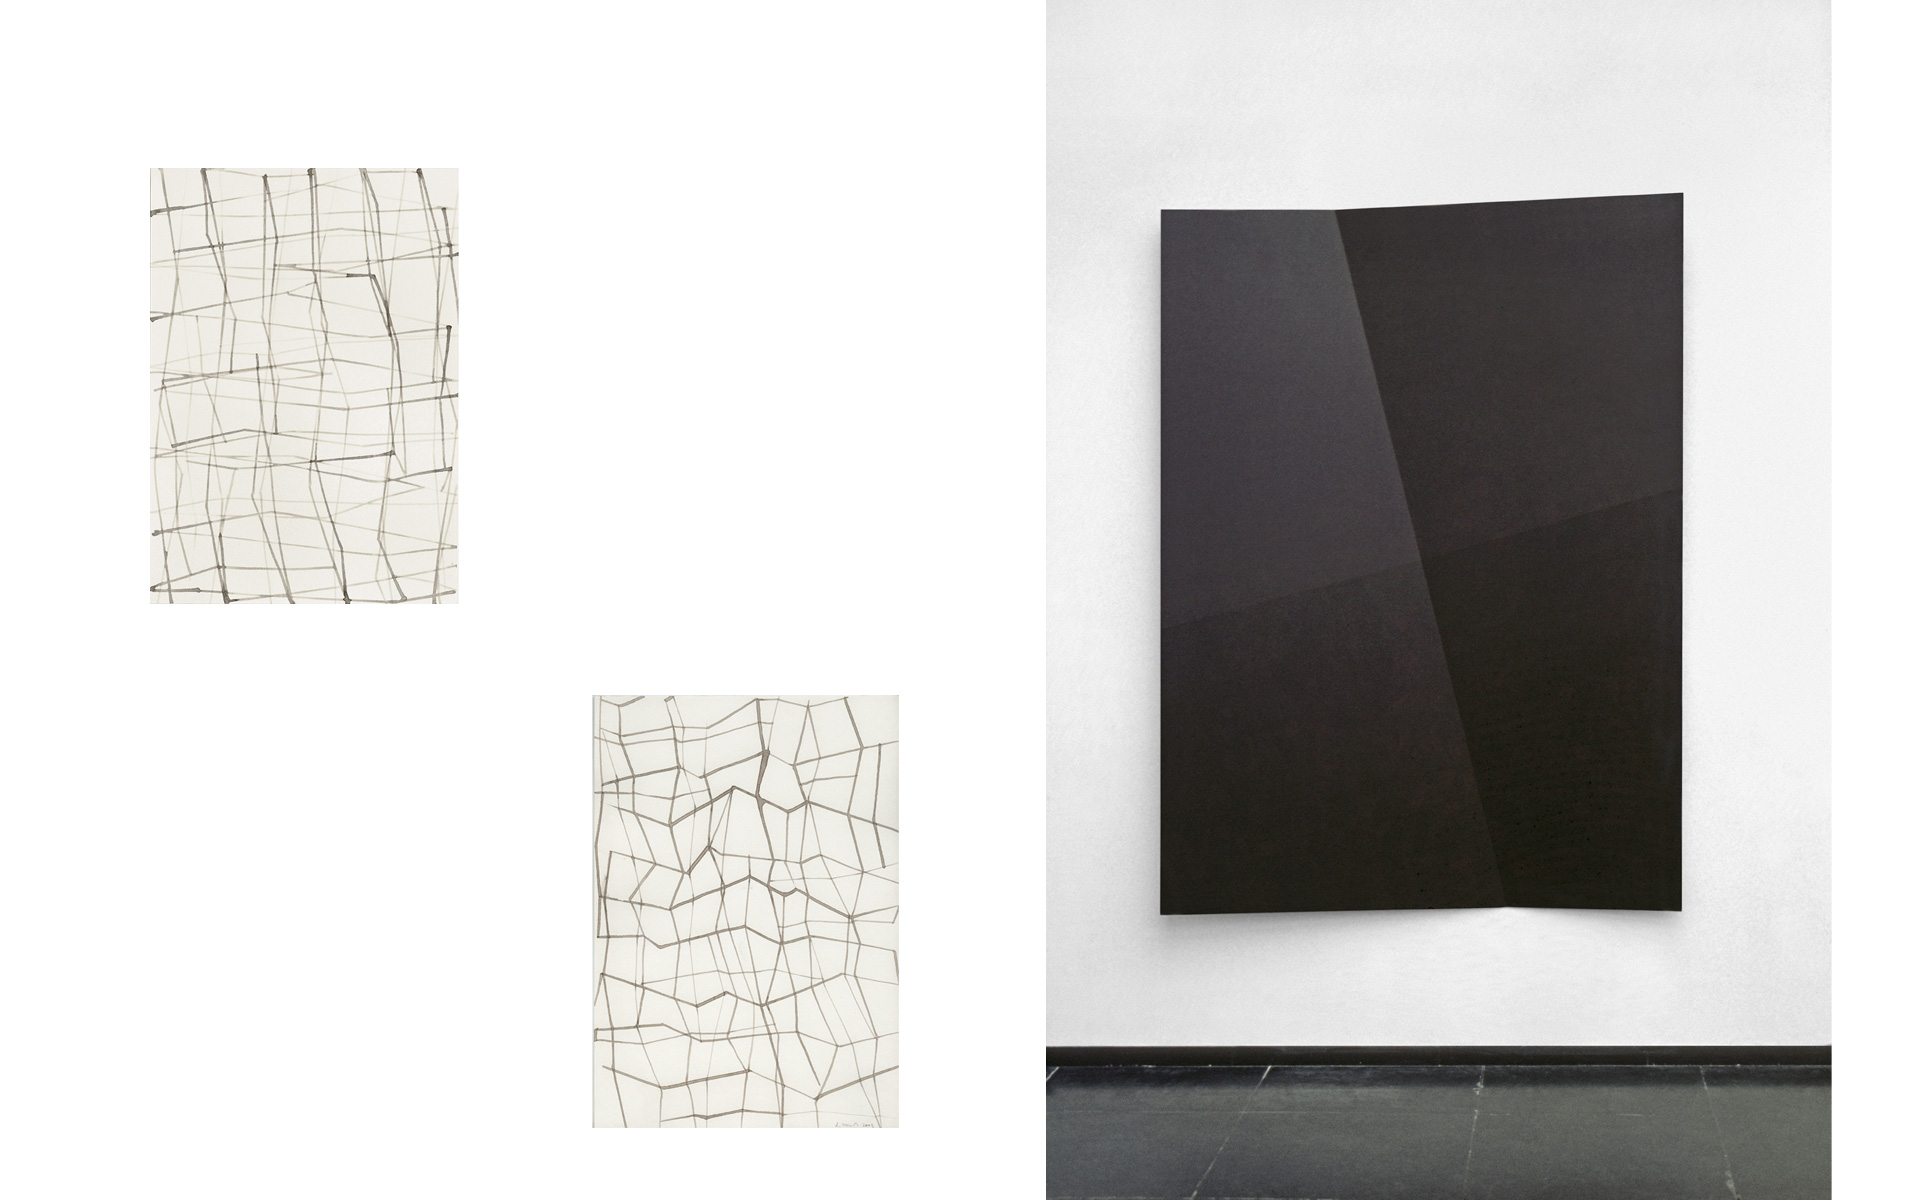 left: each O. T., 2005 Ink on paper 29.7 × 21 cm / right: FALTUNGEN, 1996 Acrylic on aluminum 200 × 150 × 20 cm - Photos: Christoph Valentien